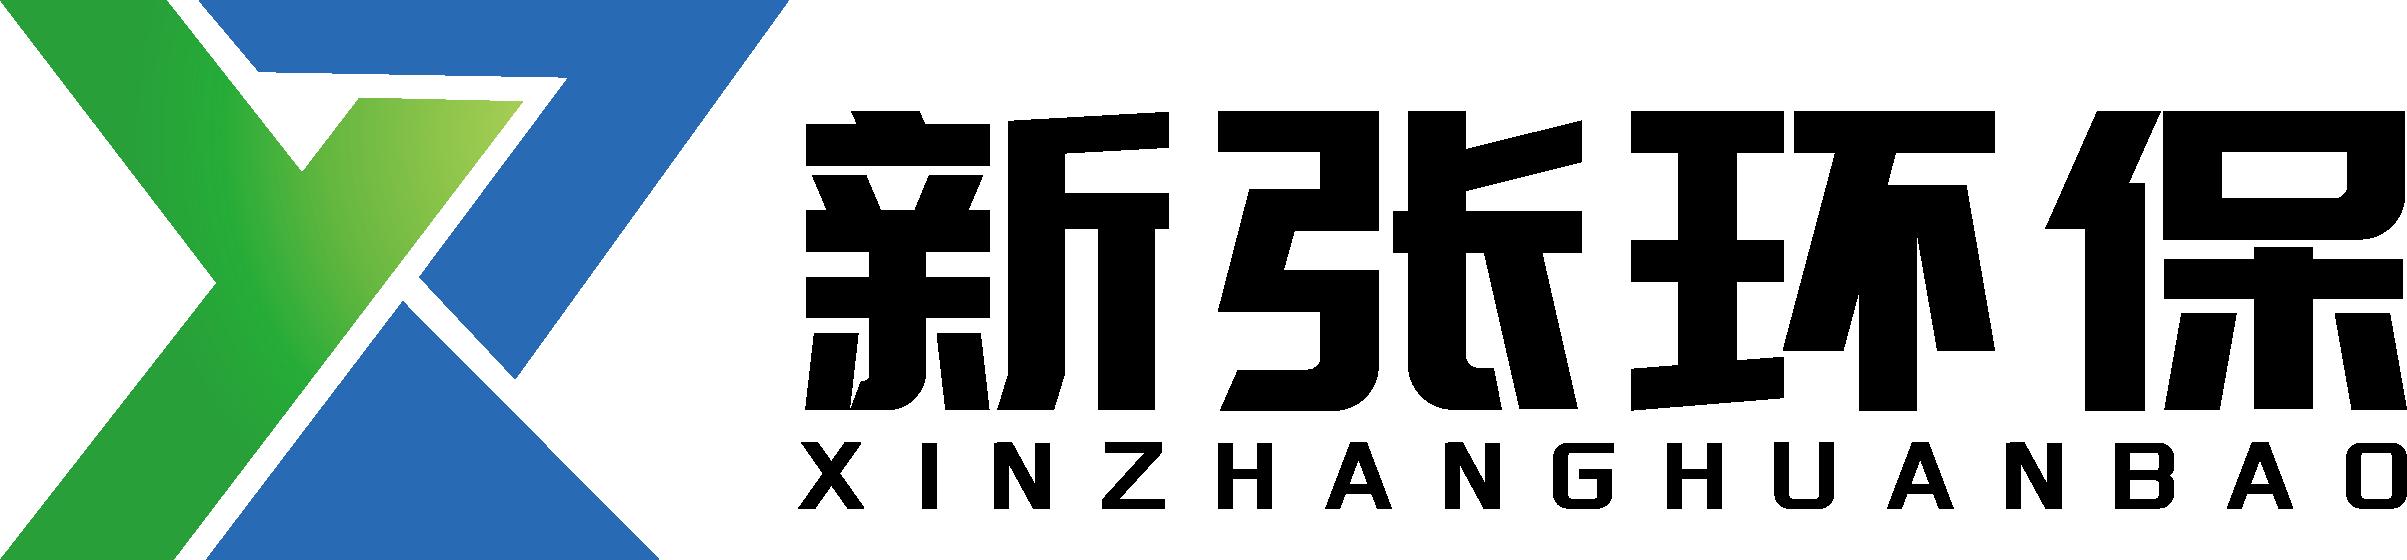 FtLA_H8521Gw8ji8mi7i-s0190vR